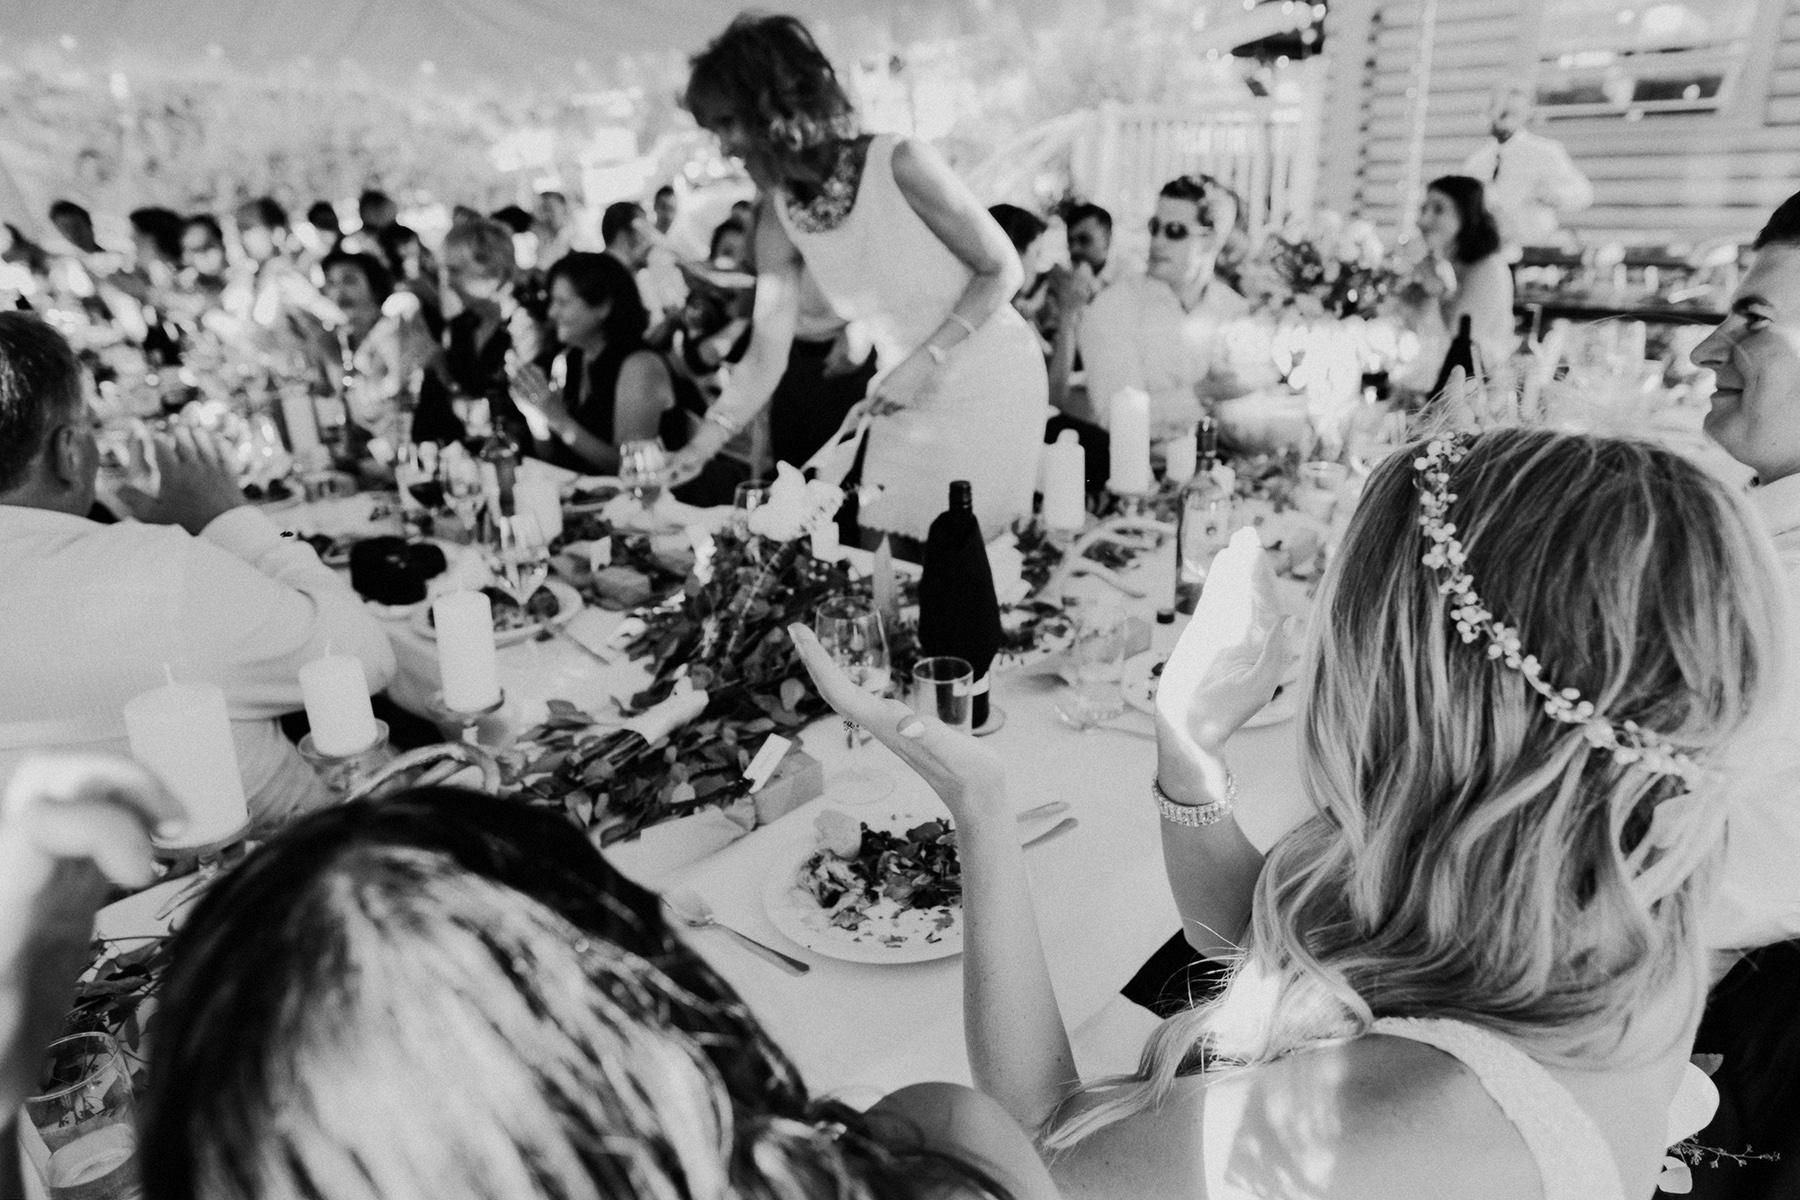 galiano-island-bodega-destination-wedding-0088.JPG